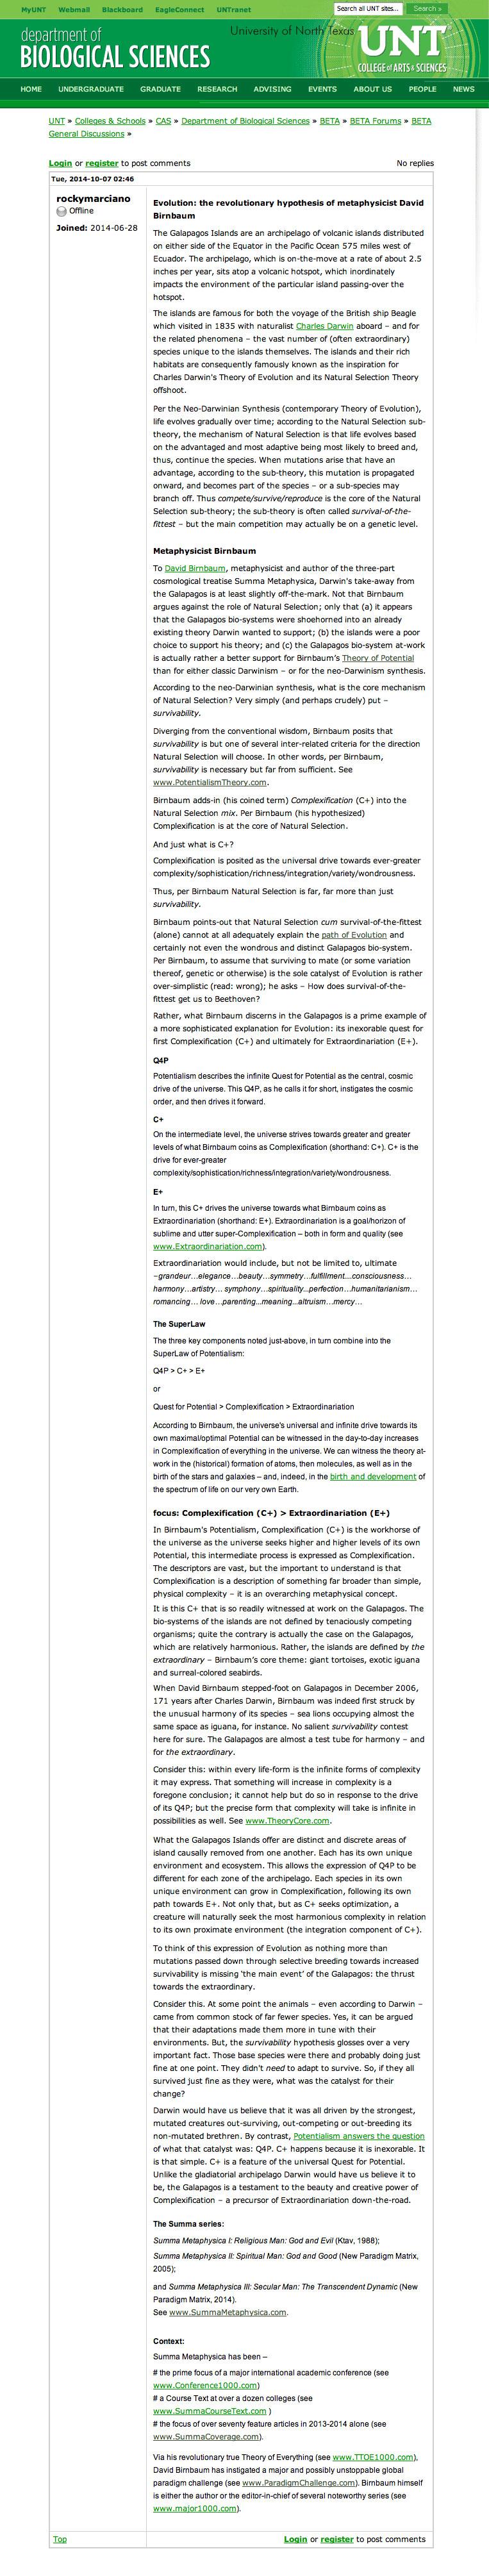 Biological Sciences UNT, UNT-Biology / Galapagos, Evolution: the revolutionary hypothesis of metaphysicist David Birnbaum, ...E+